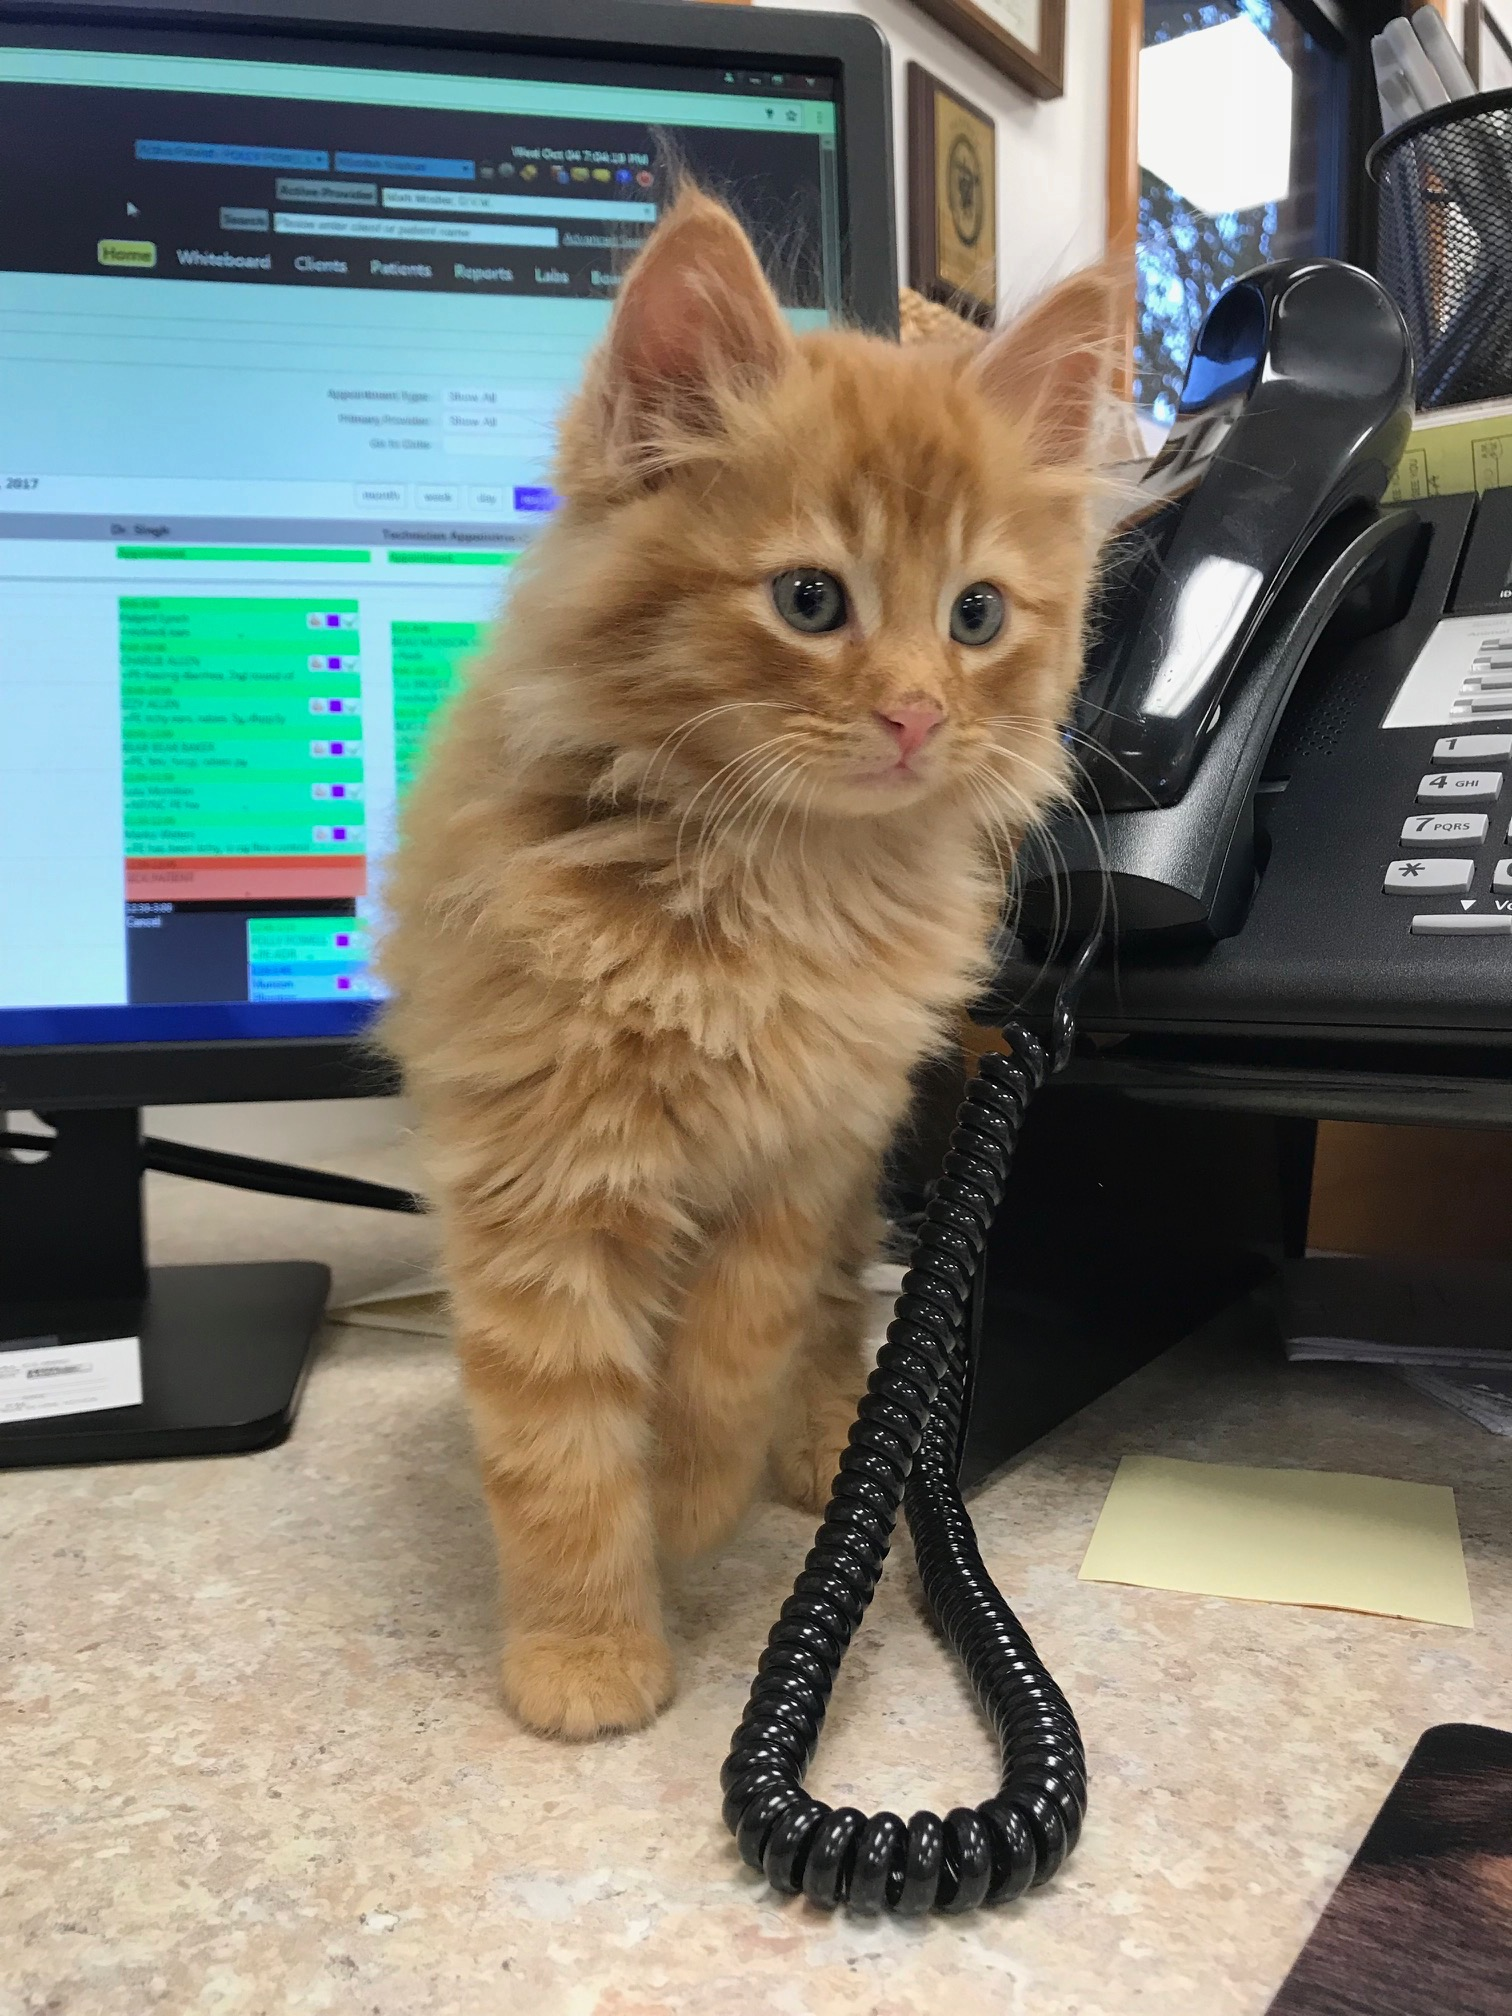 orange kitten by phone.jpg